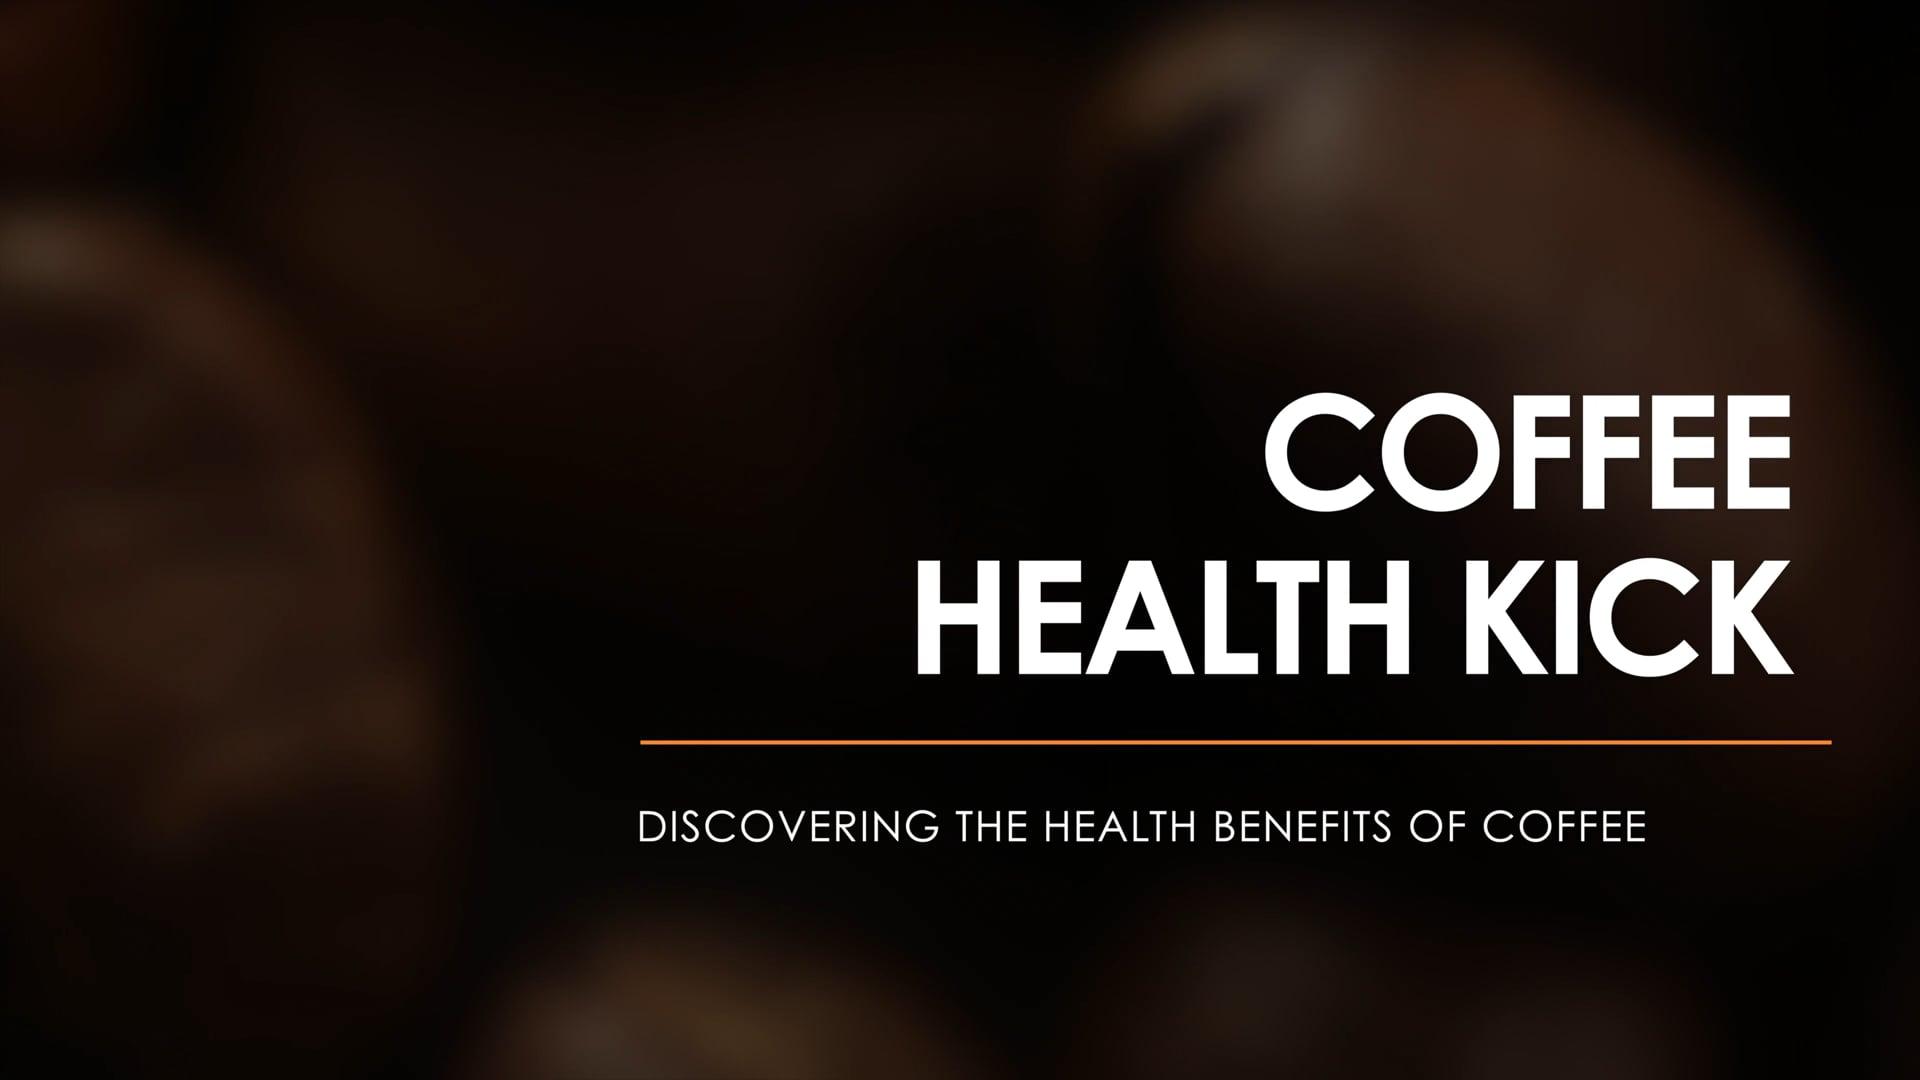 Coffee Health Kick 4k